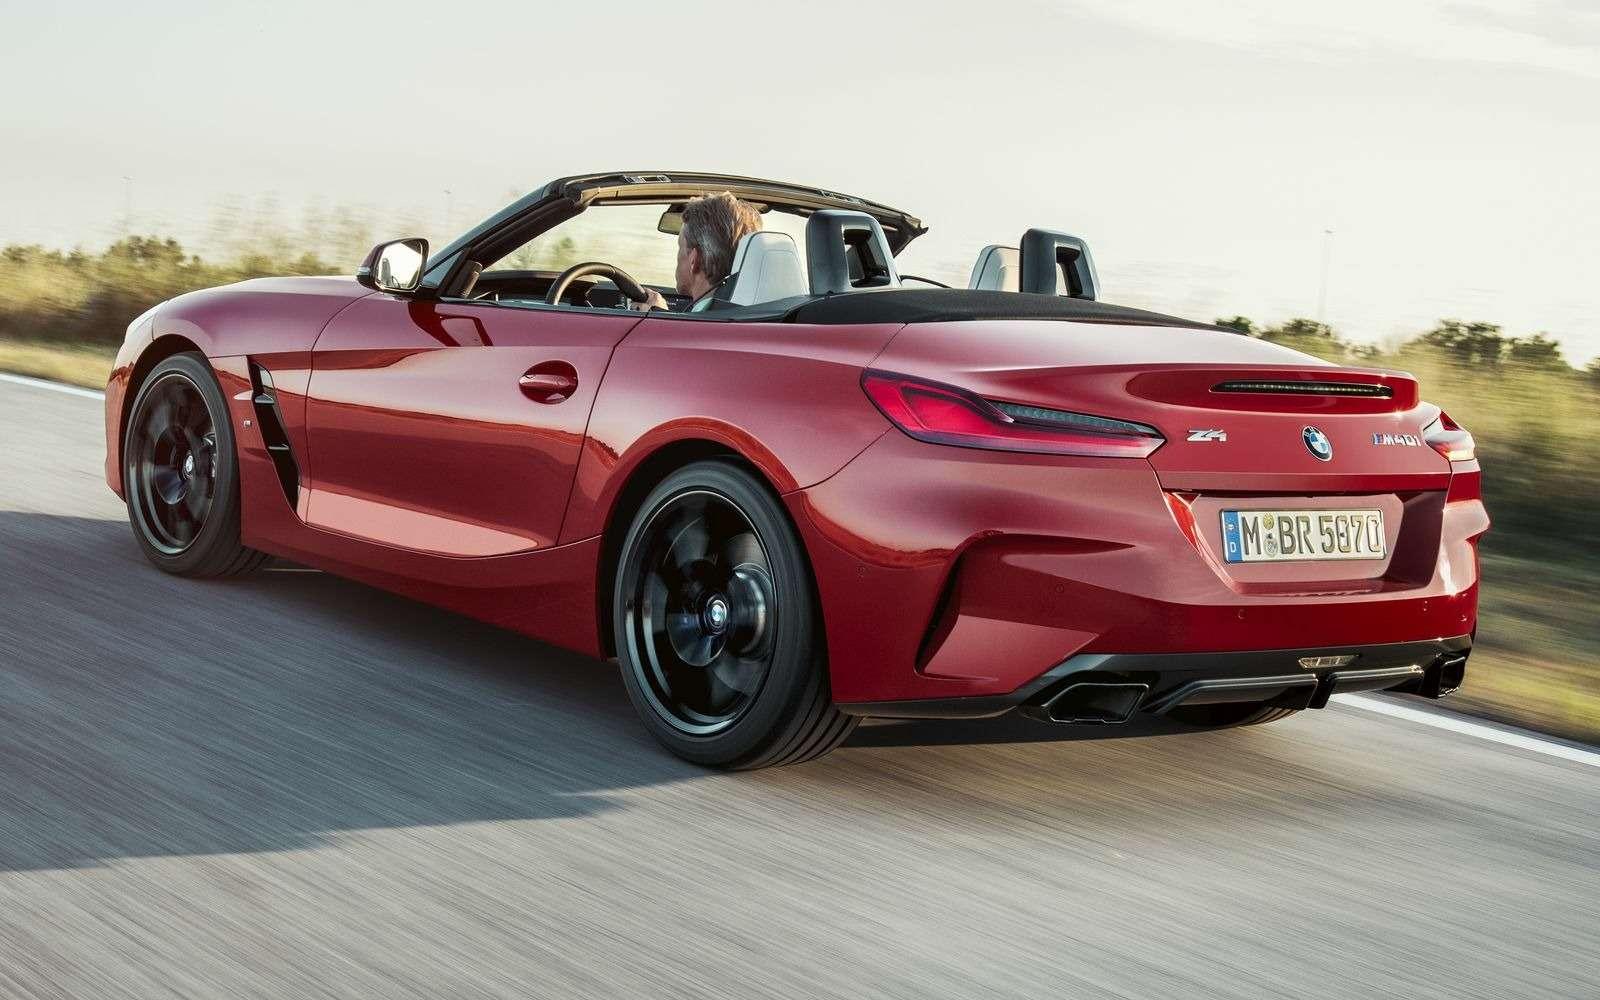 Новый родстер BMW Z4представлен официально— фото 898542